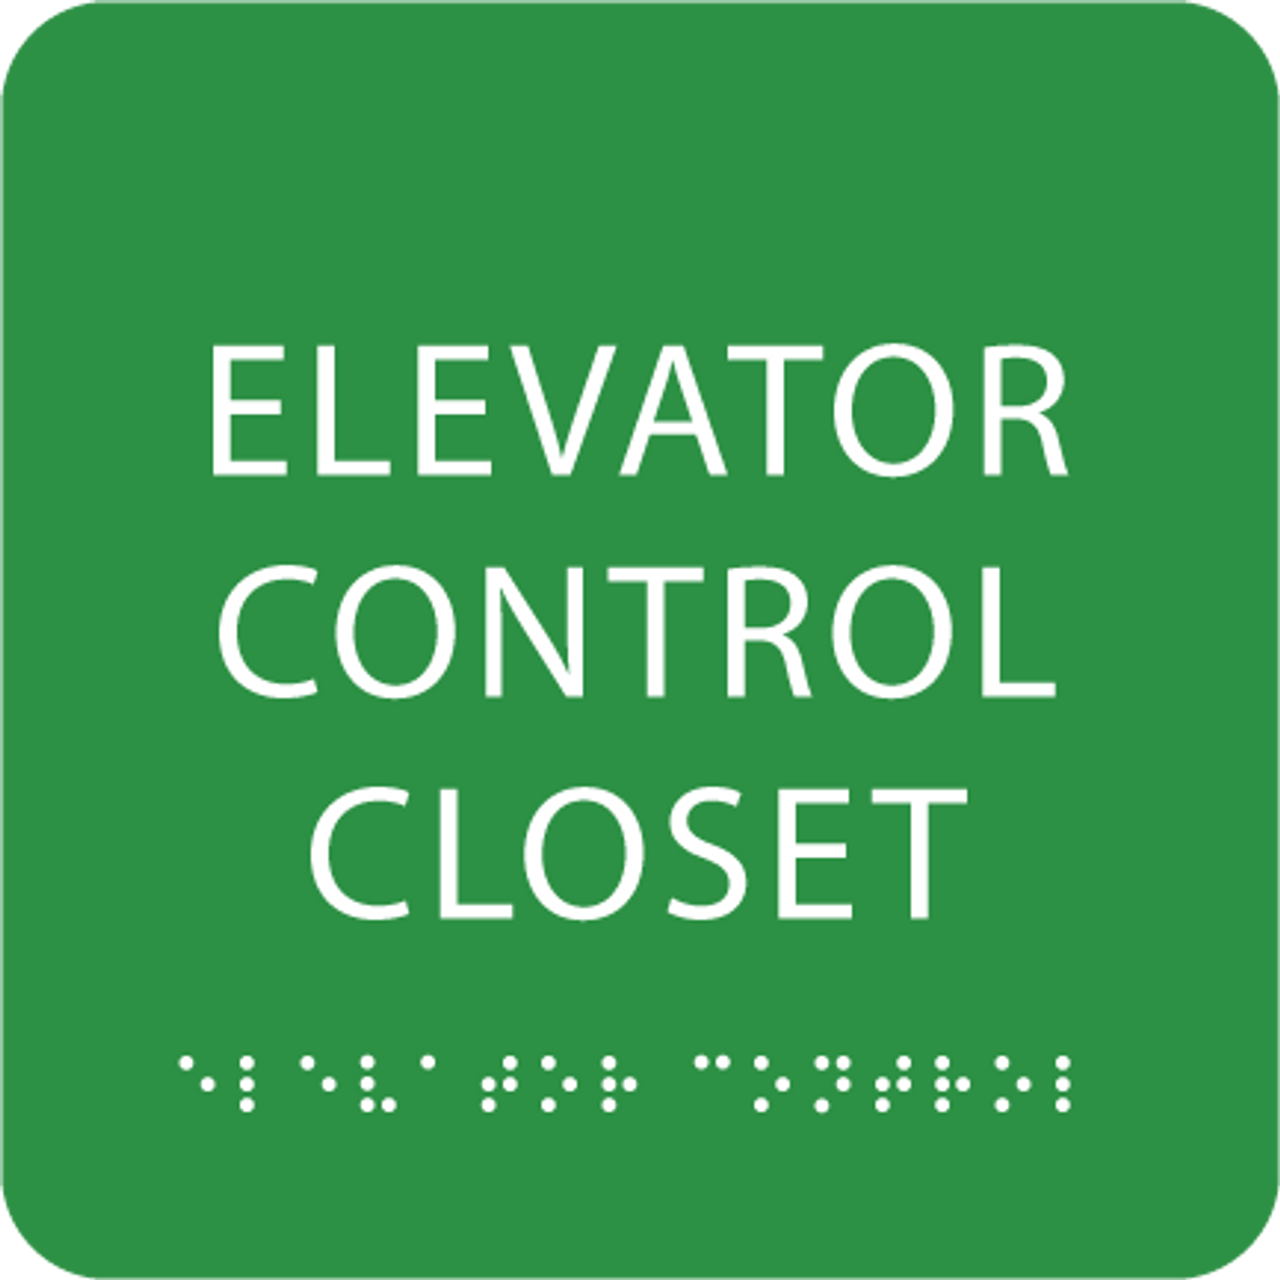 Green Elevator Control Closet Tactile Sign